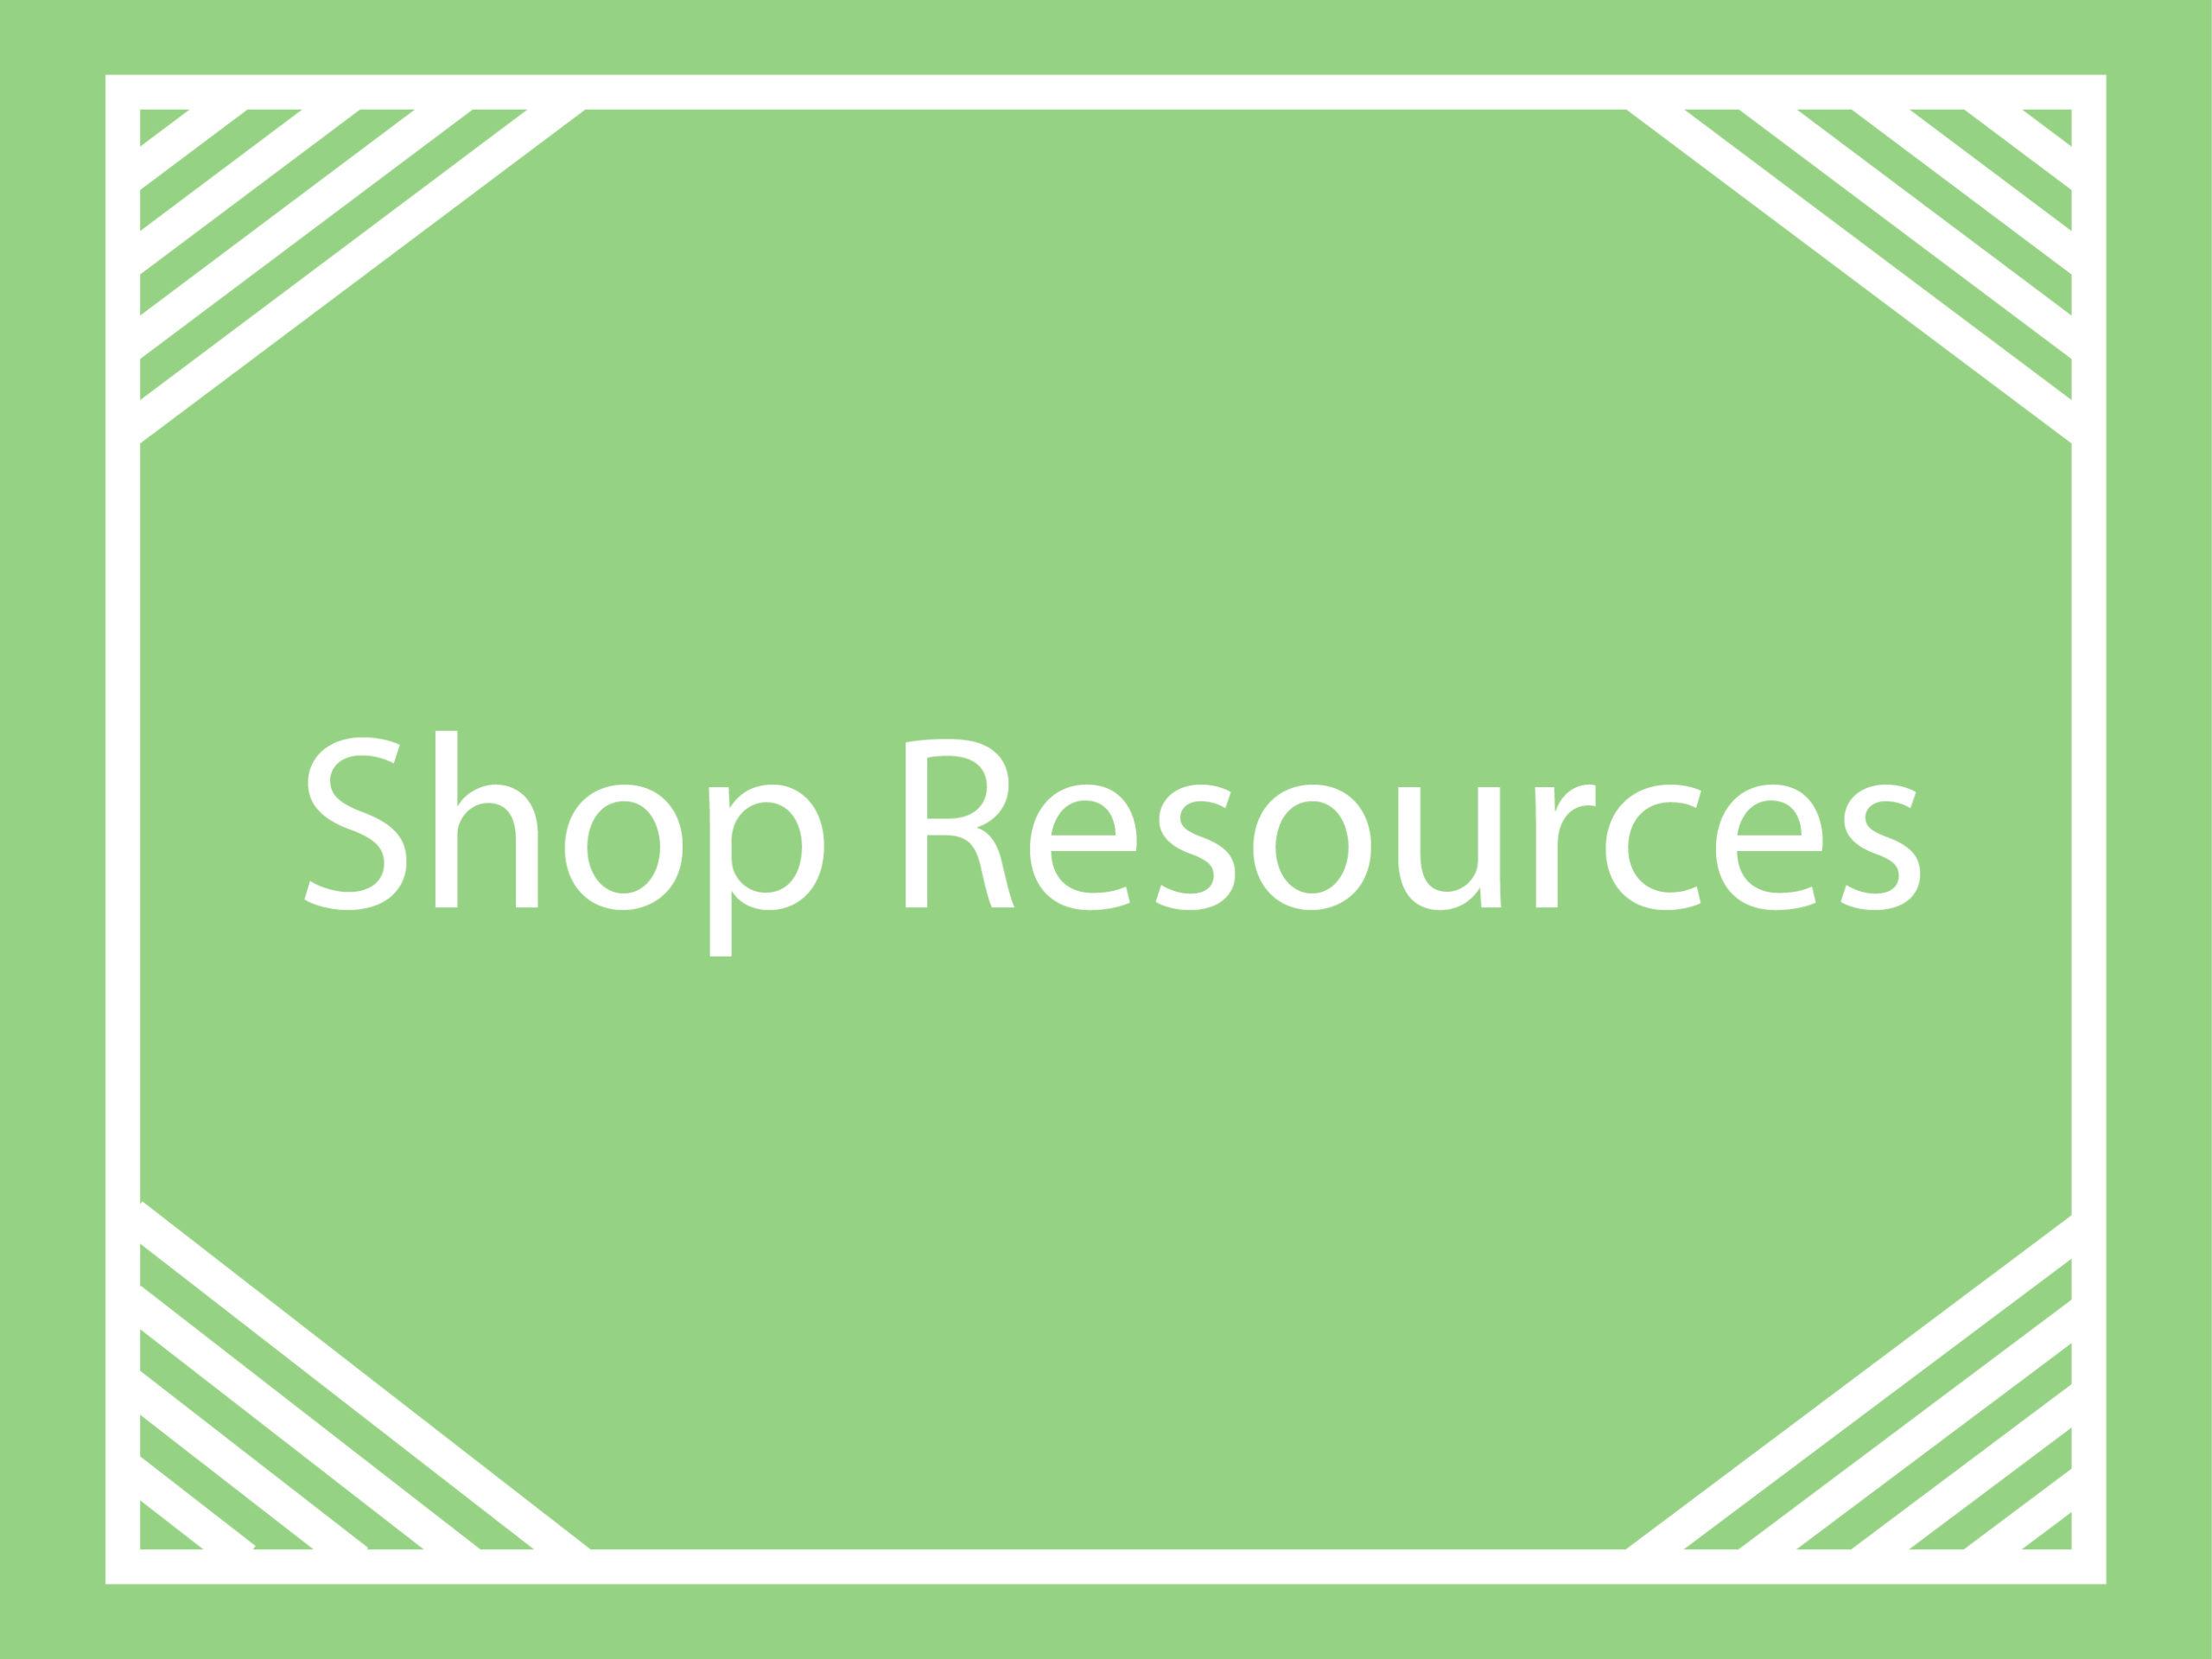 Shop Resources